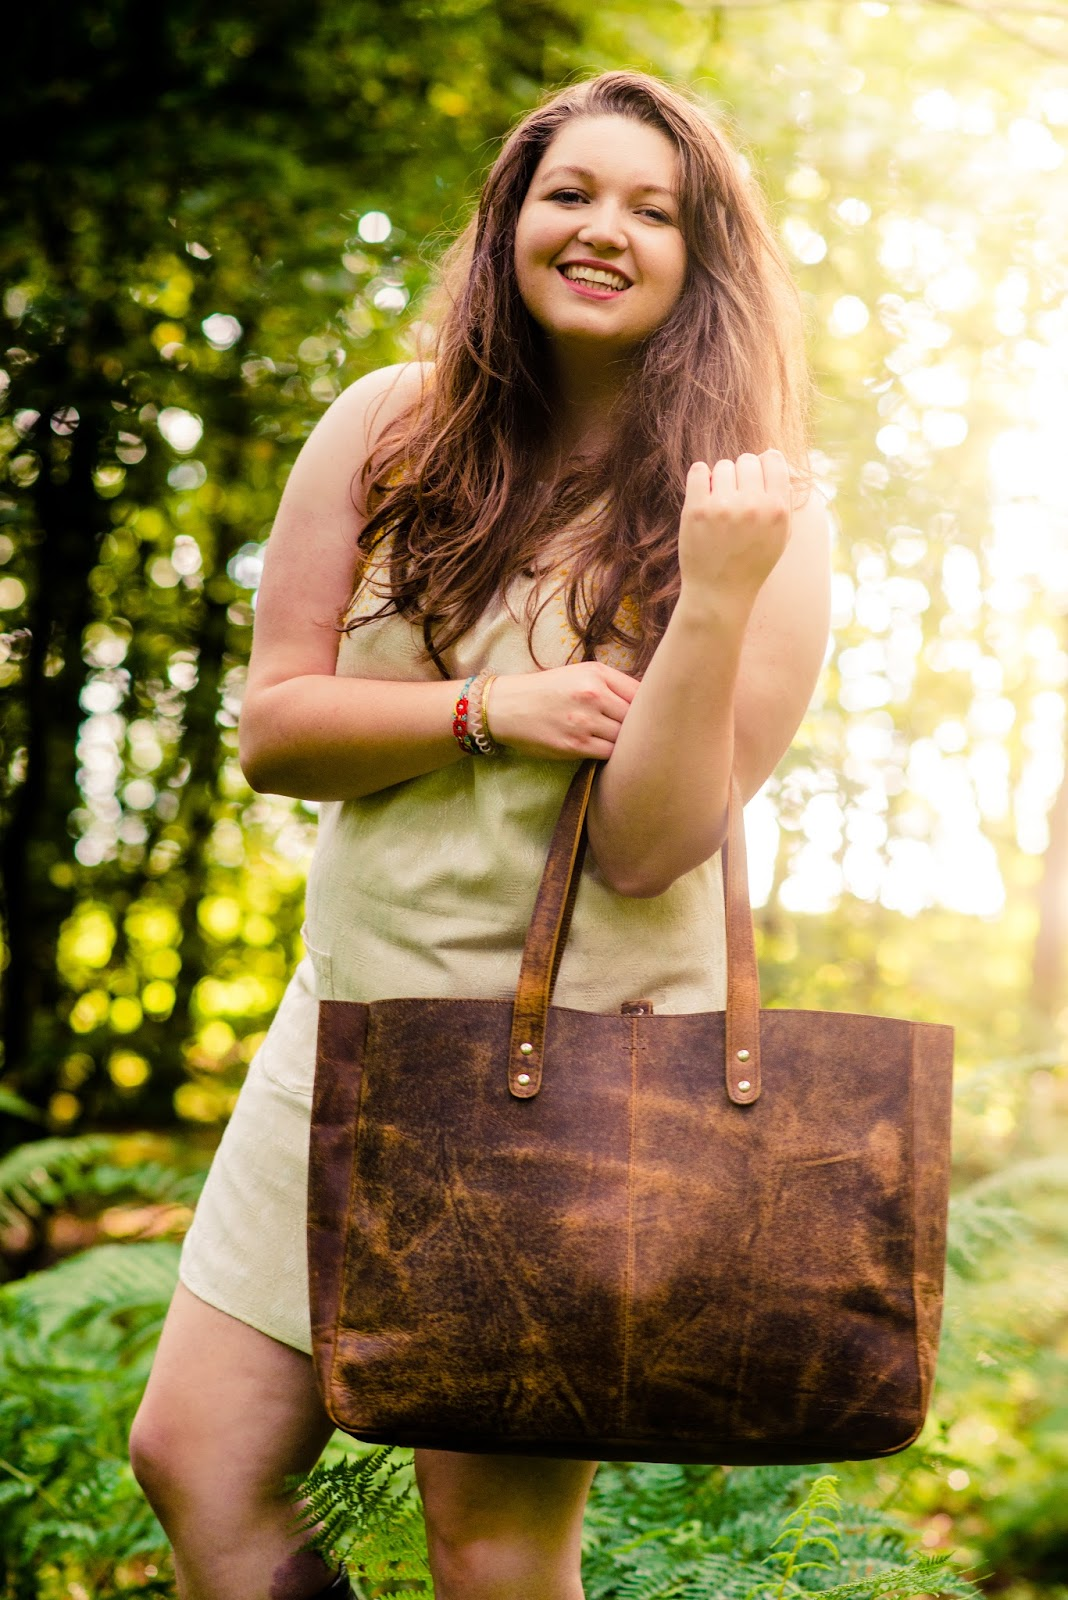 liquid grain liquidgrain scaramanga st andrews leather tote shopper blog